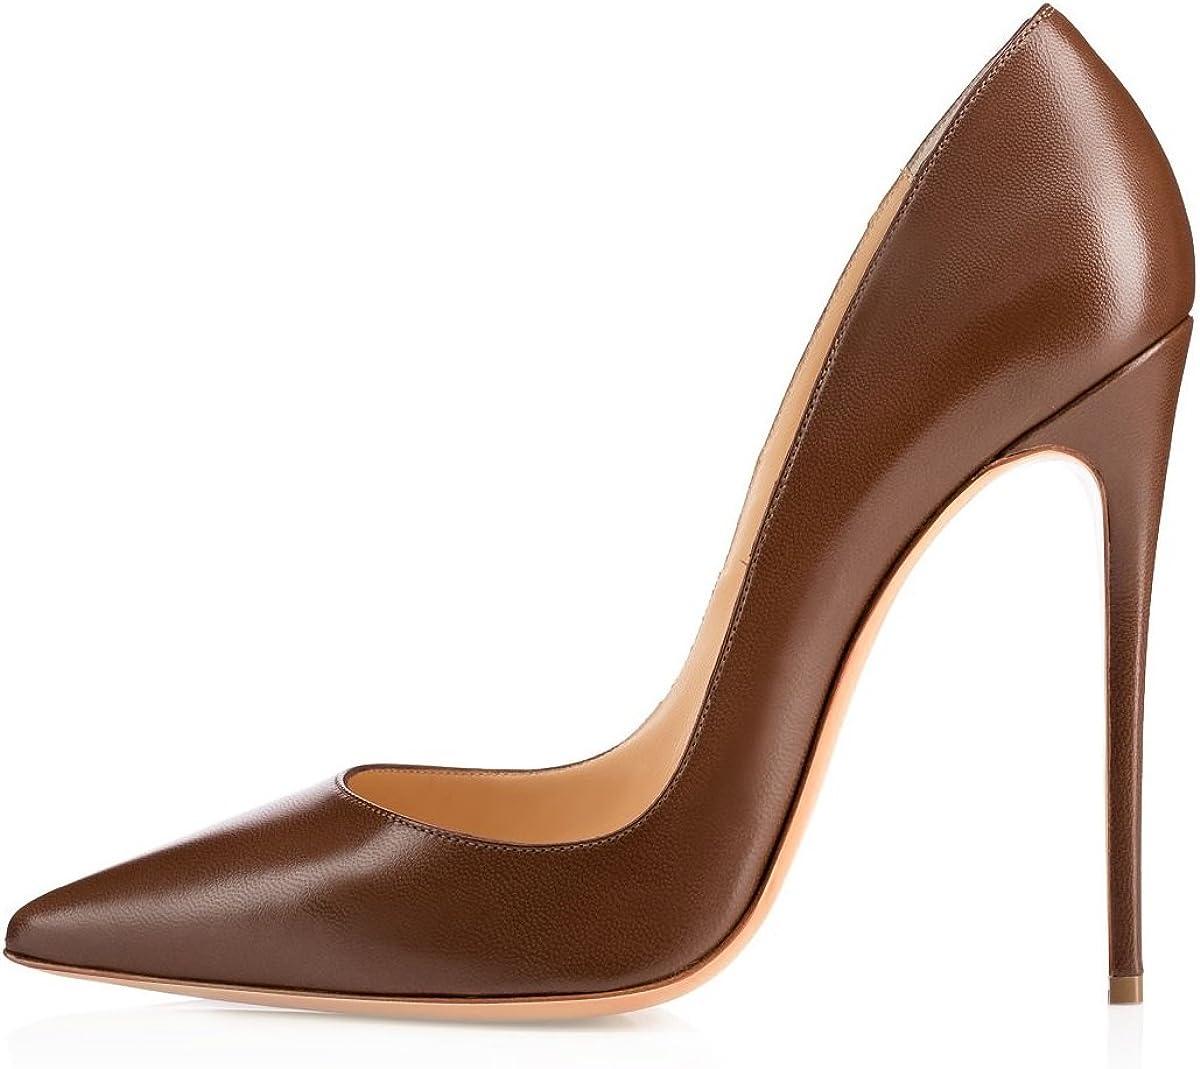 SAMMITOP Women's Classic Pointed Toe High Ranking TOP14 Ranking TOP20 Stilettos S Pumps Heel